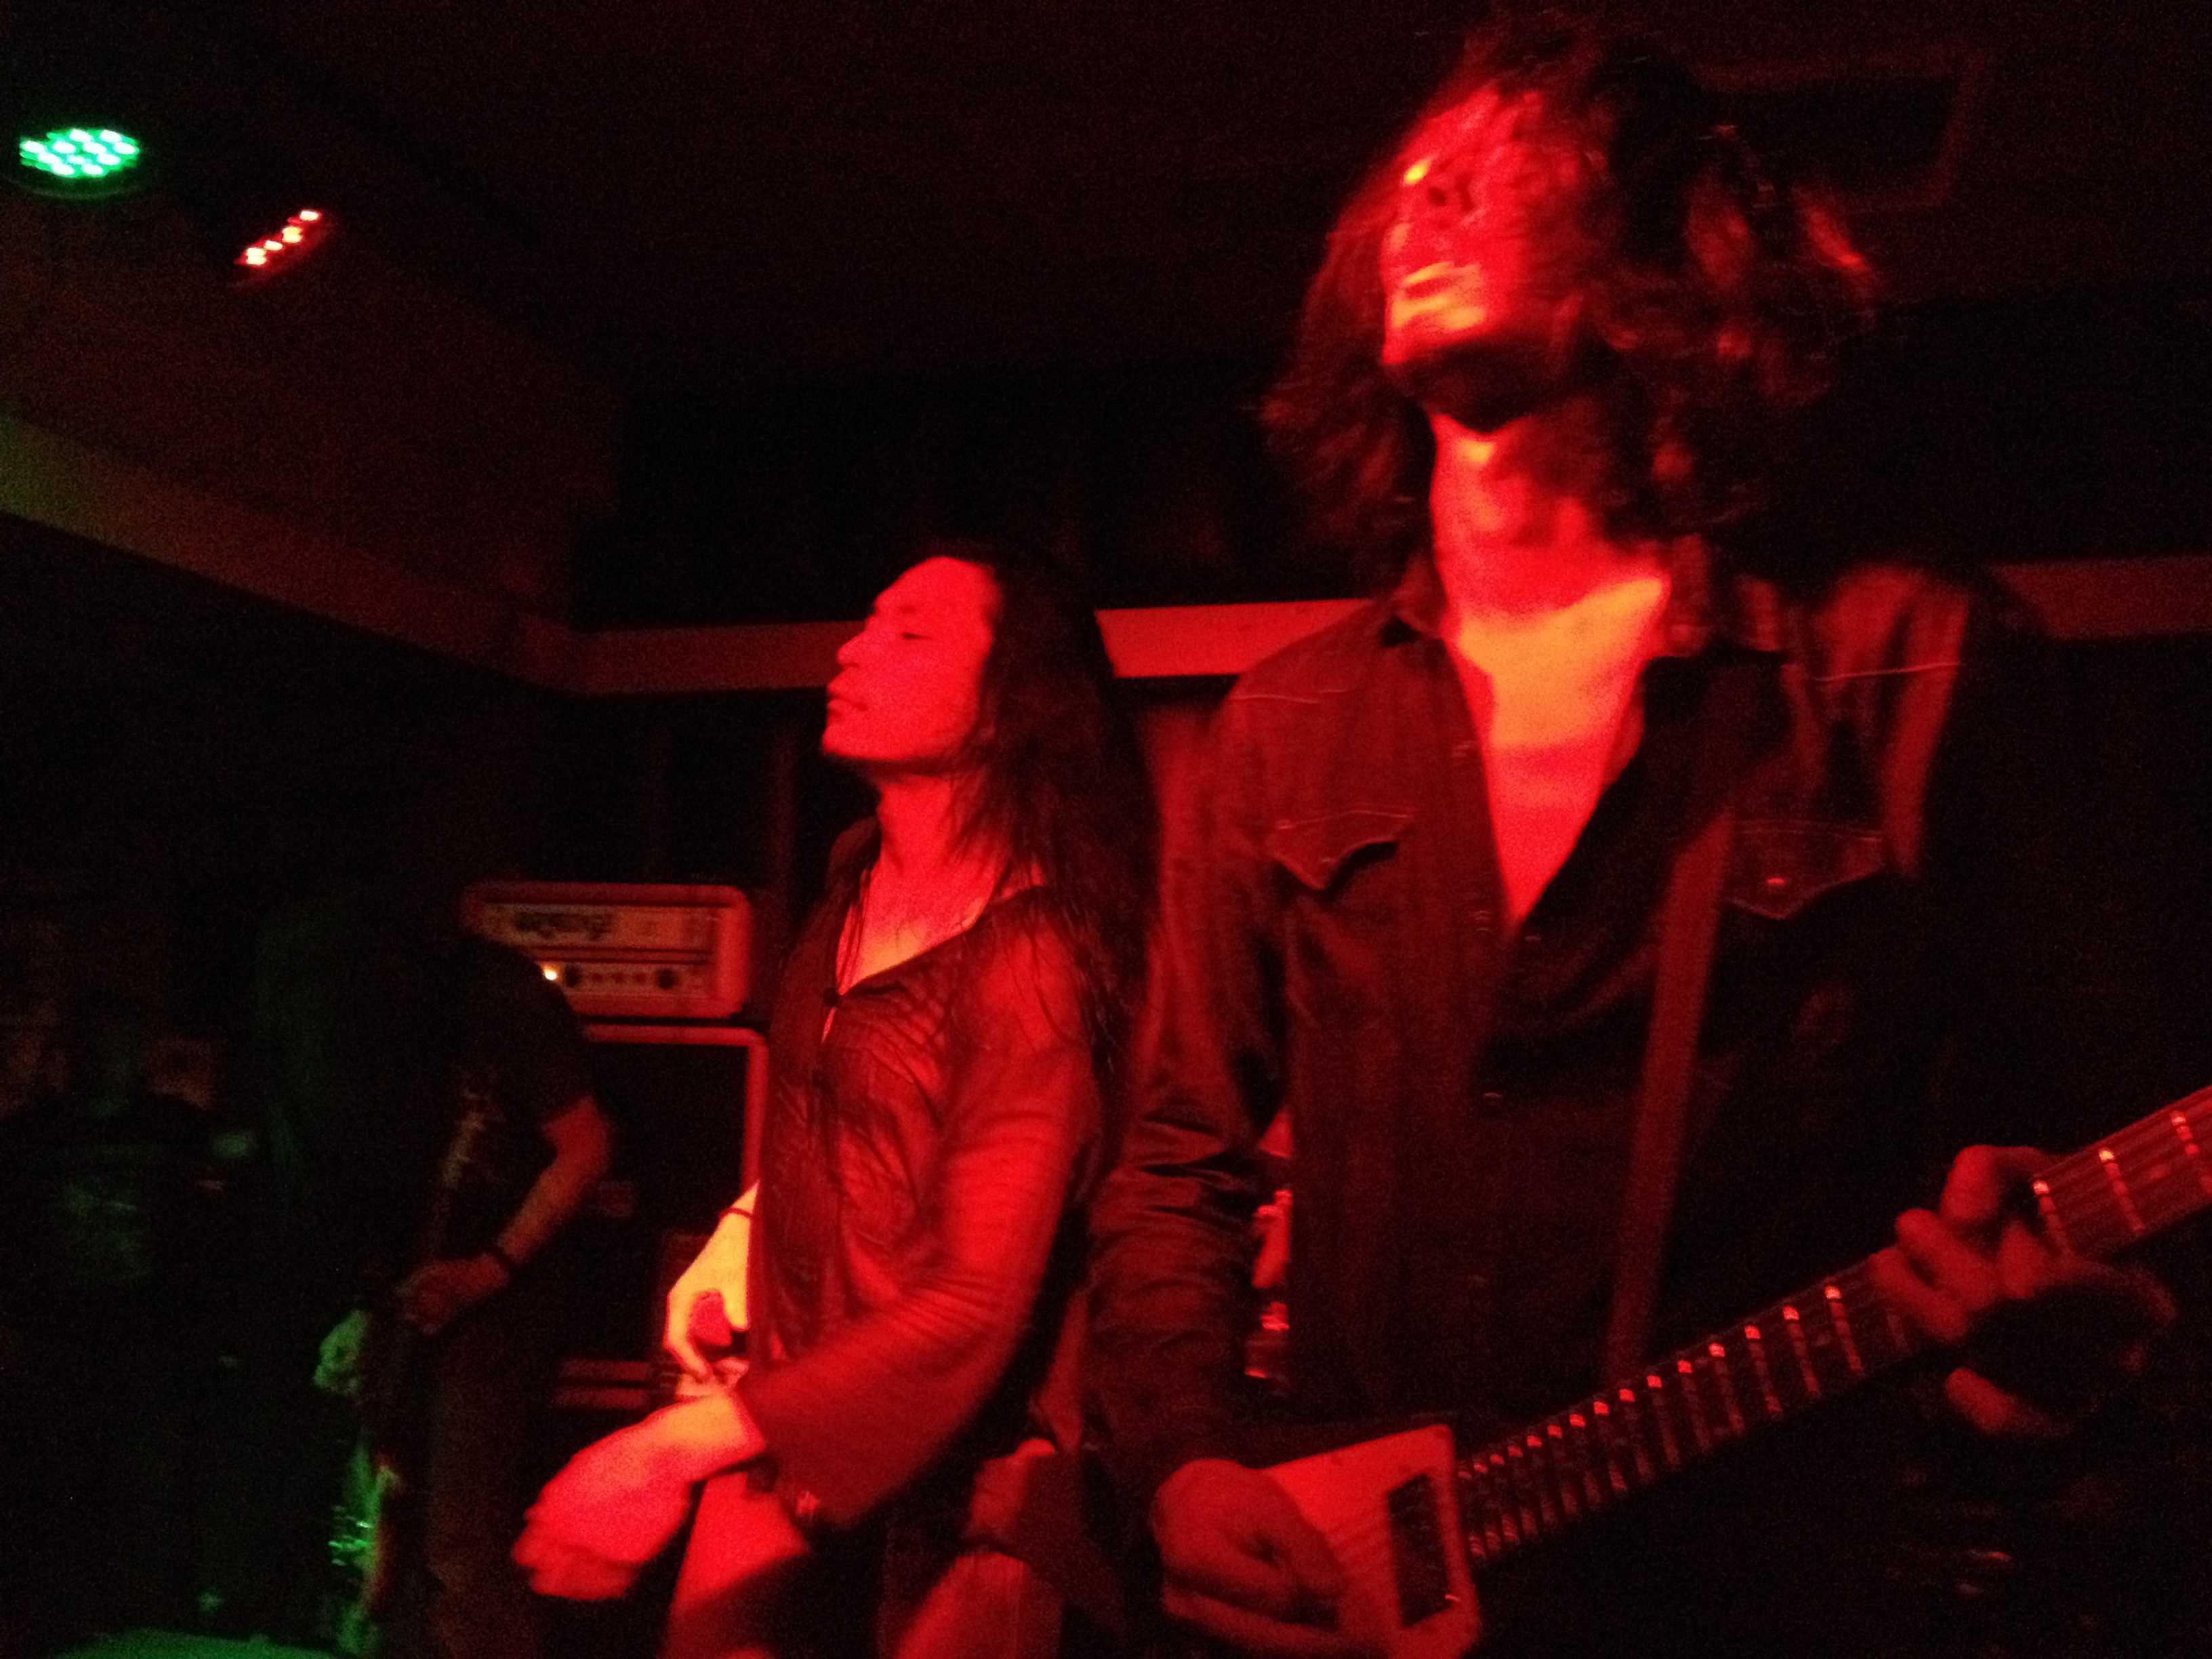 On the far left is bassist and founder Tatsu Mikami, center vocalist Hideki Fukasawa, right lead guitarist Ikuma Kawabe. From their Thanksgiving show at San Diego's Soda Bar. Jennifer Ovalle, City Times.